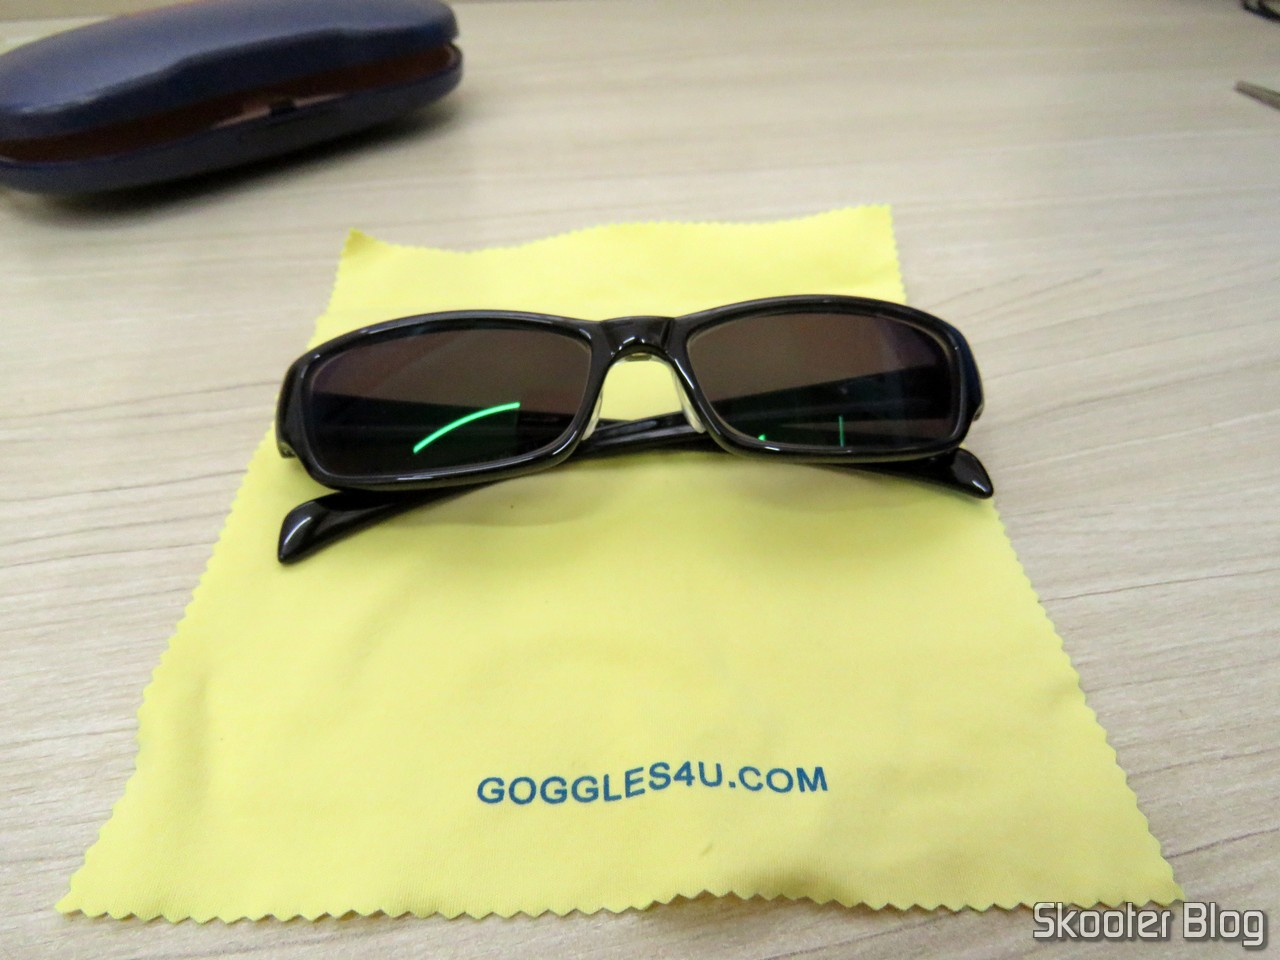 f37f0d28b Óculos de Sol com Grau, Lente Preta Escura (G4U T3022 Rectangle Eyeglasses  124765-